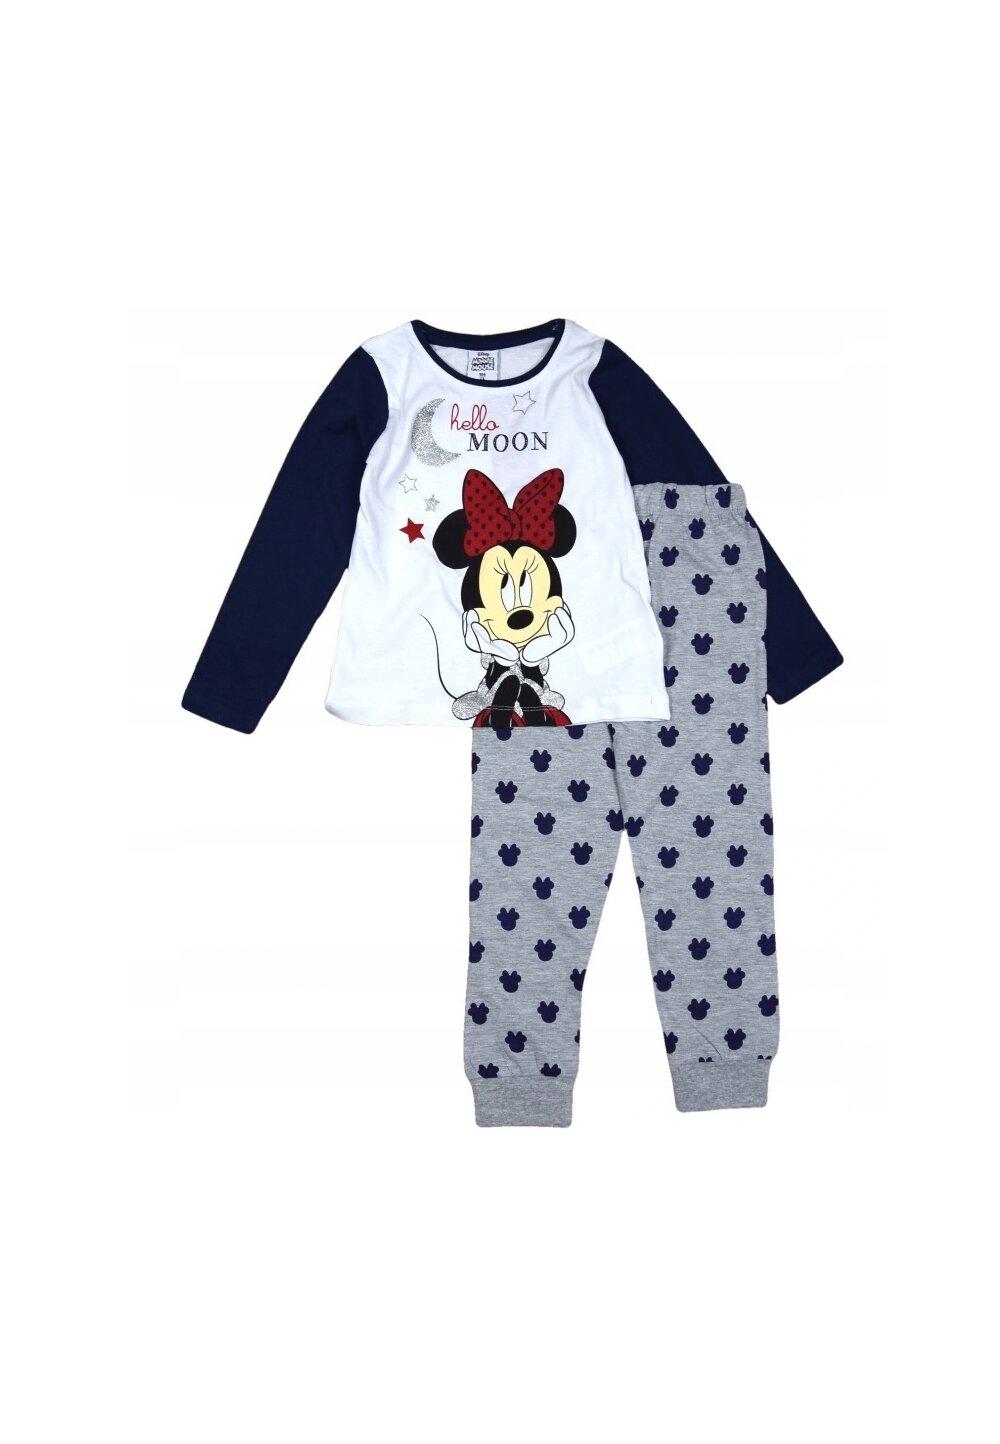 Pijama maneca lunga, Hello moon, bluemarin imagine